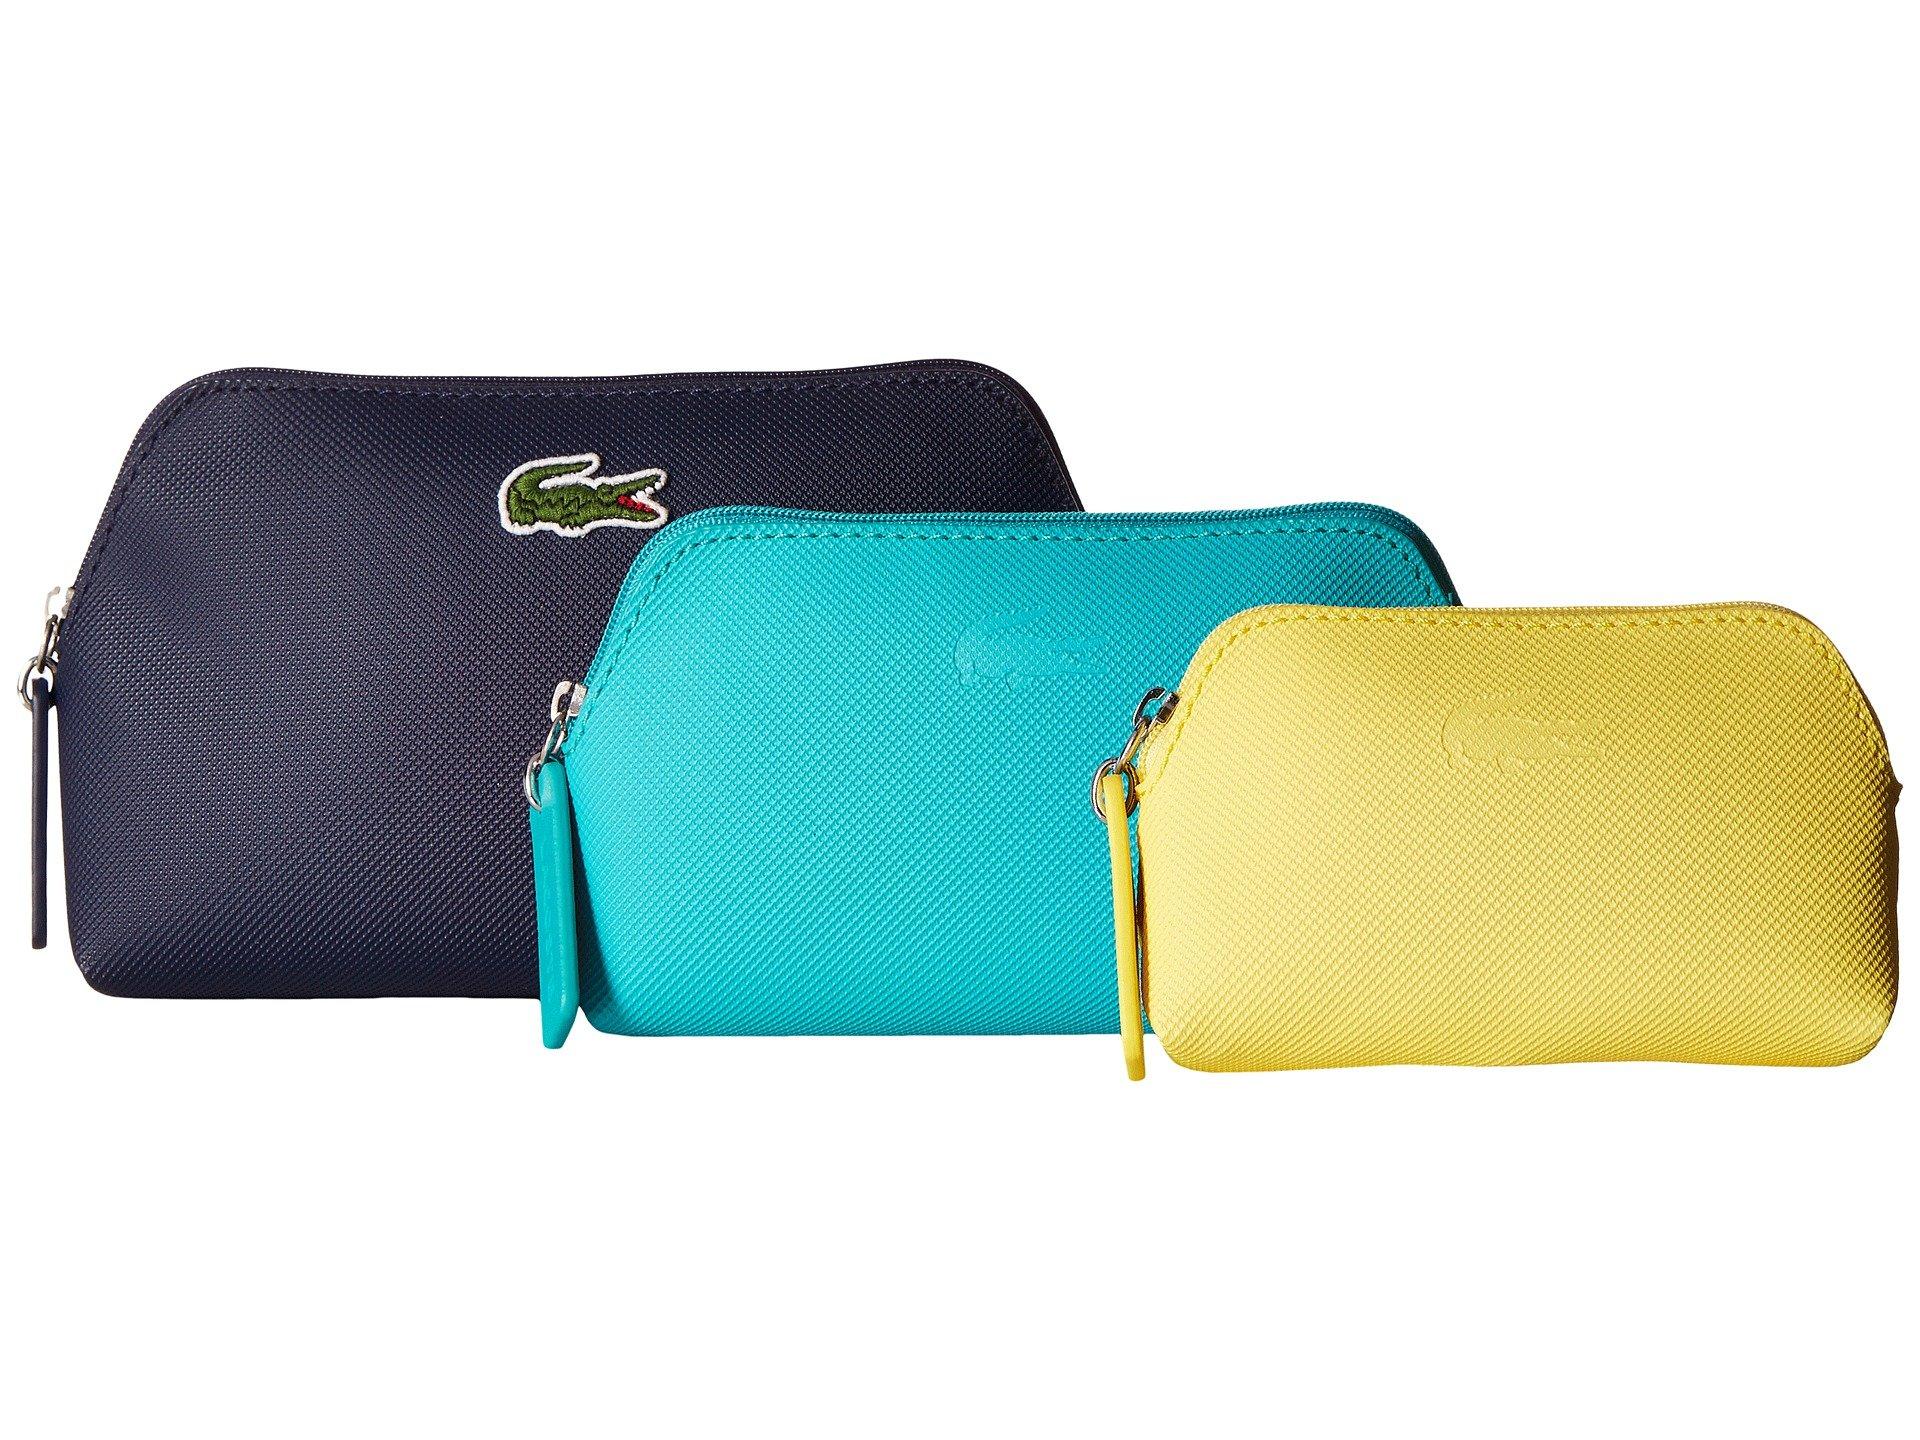 Bolso Accesorio de Viaje para Mujer Lacoste L.12.12 Concept 3 Size Make Up Pouches  + Lacoste en VeoyCompro.net